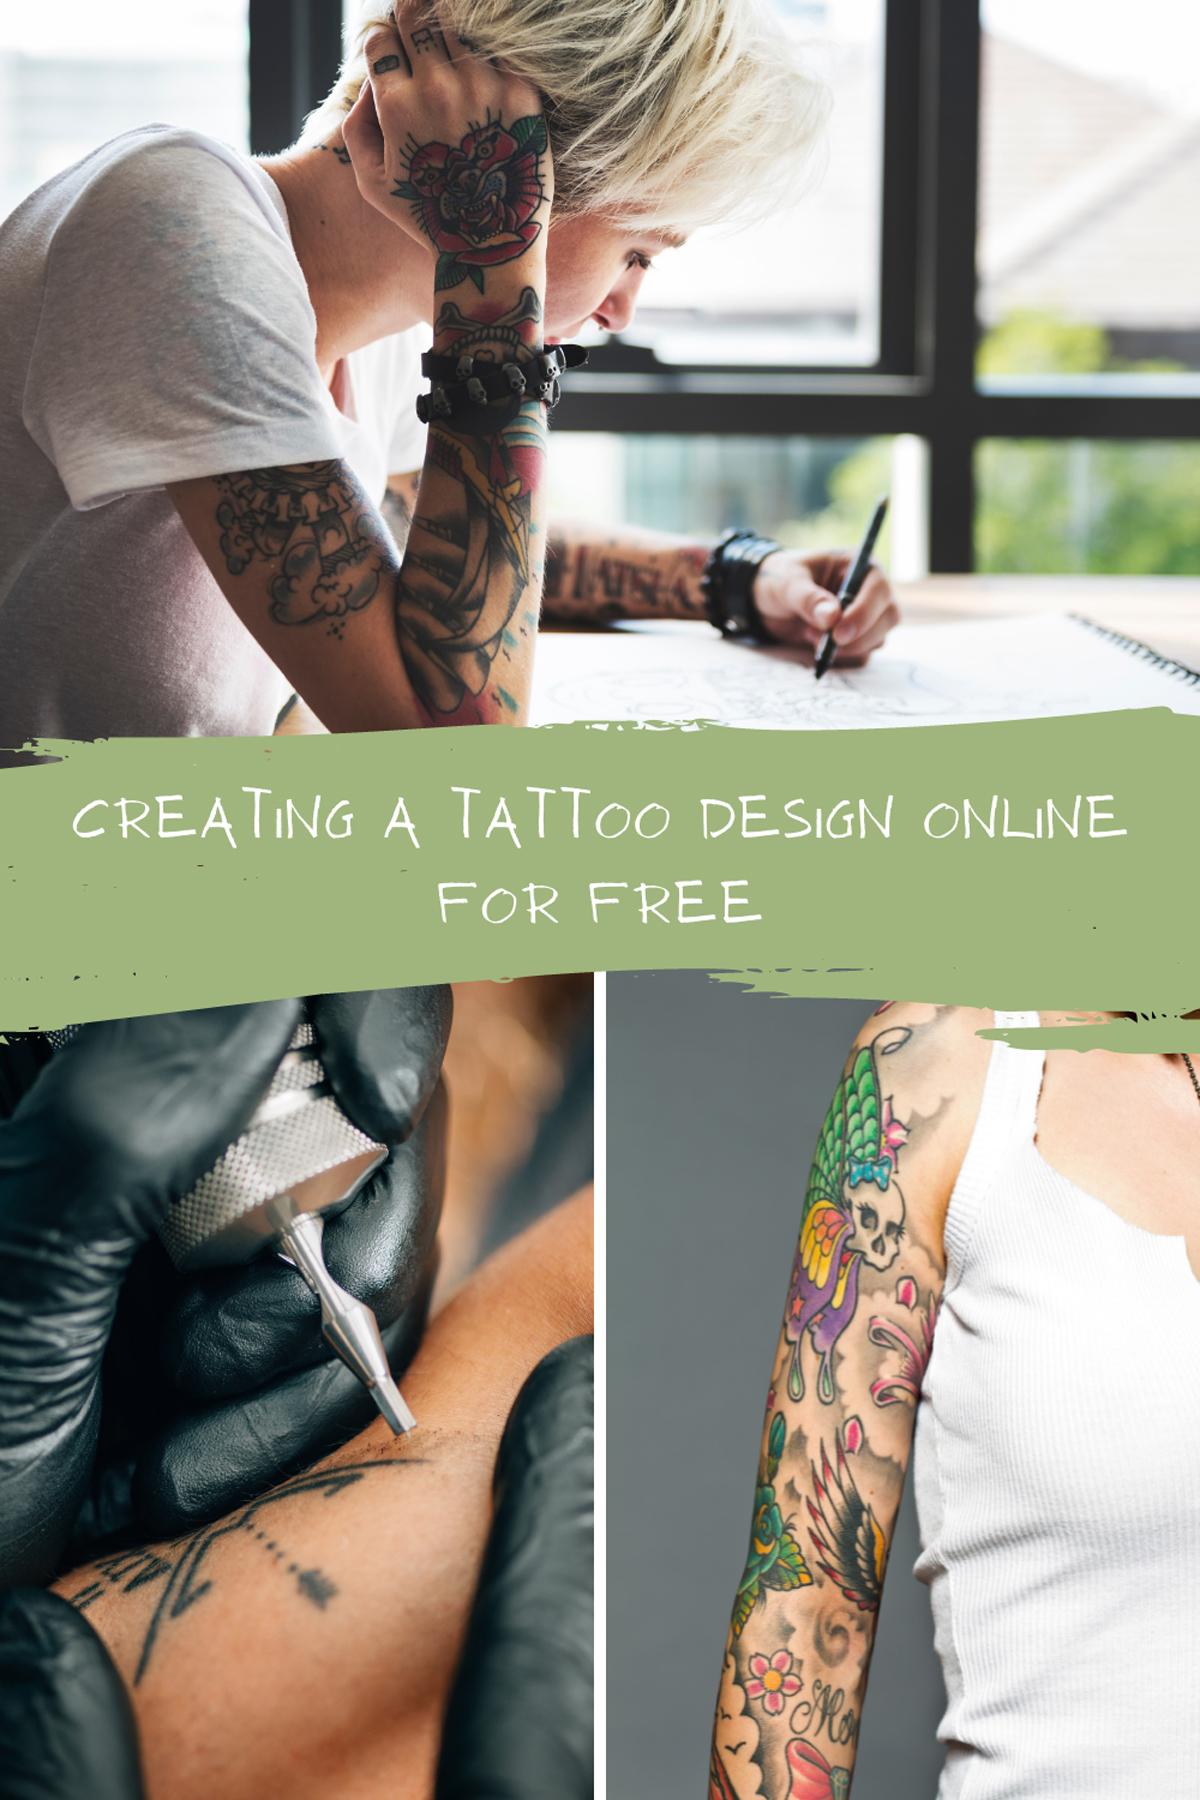 Creating a Custom Tattoo Online